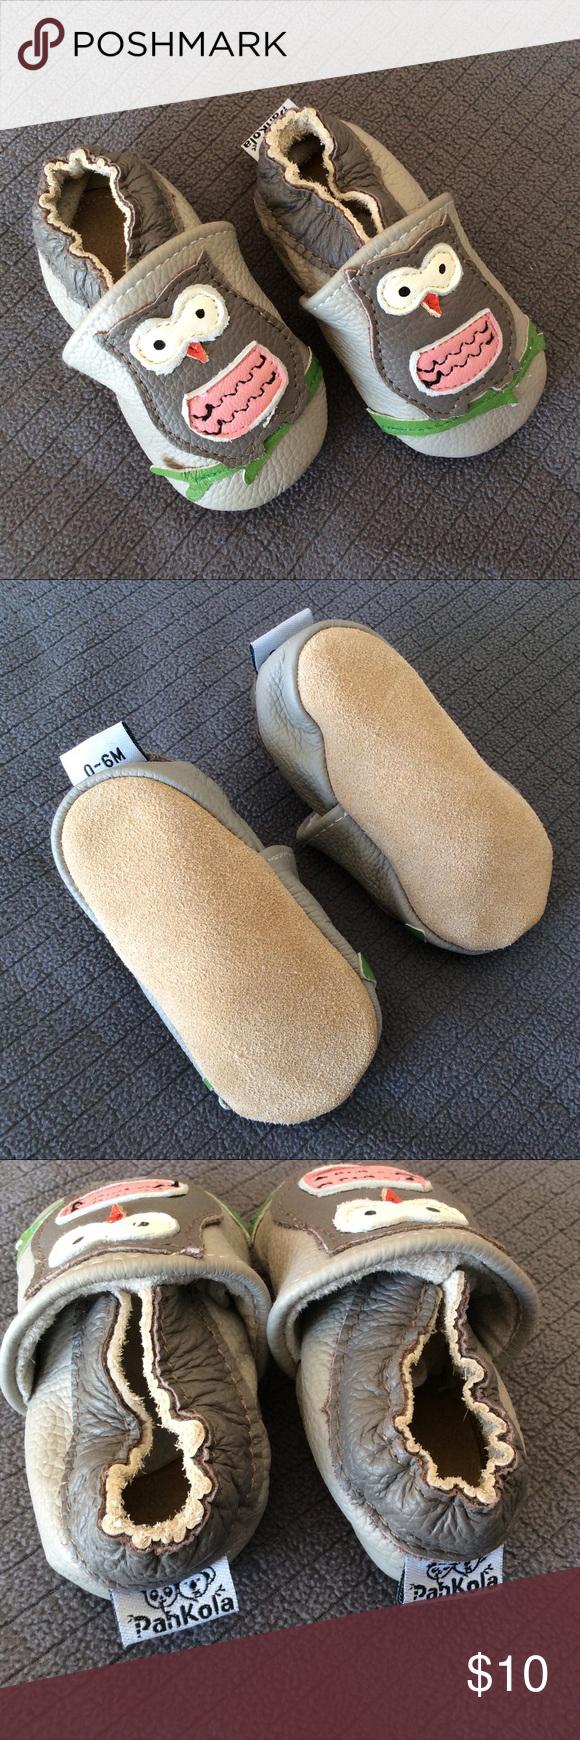 Owl shoes EUC Pankola infant shoes size